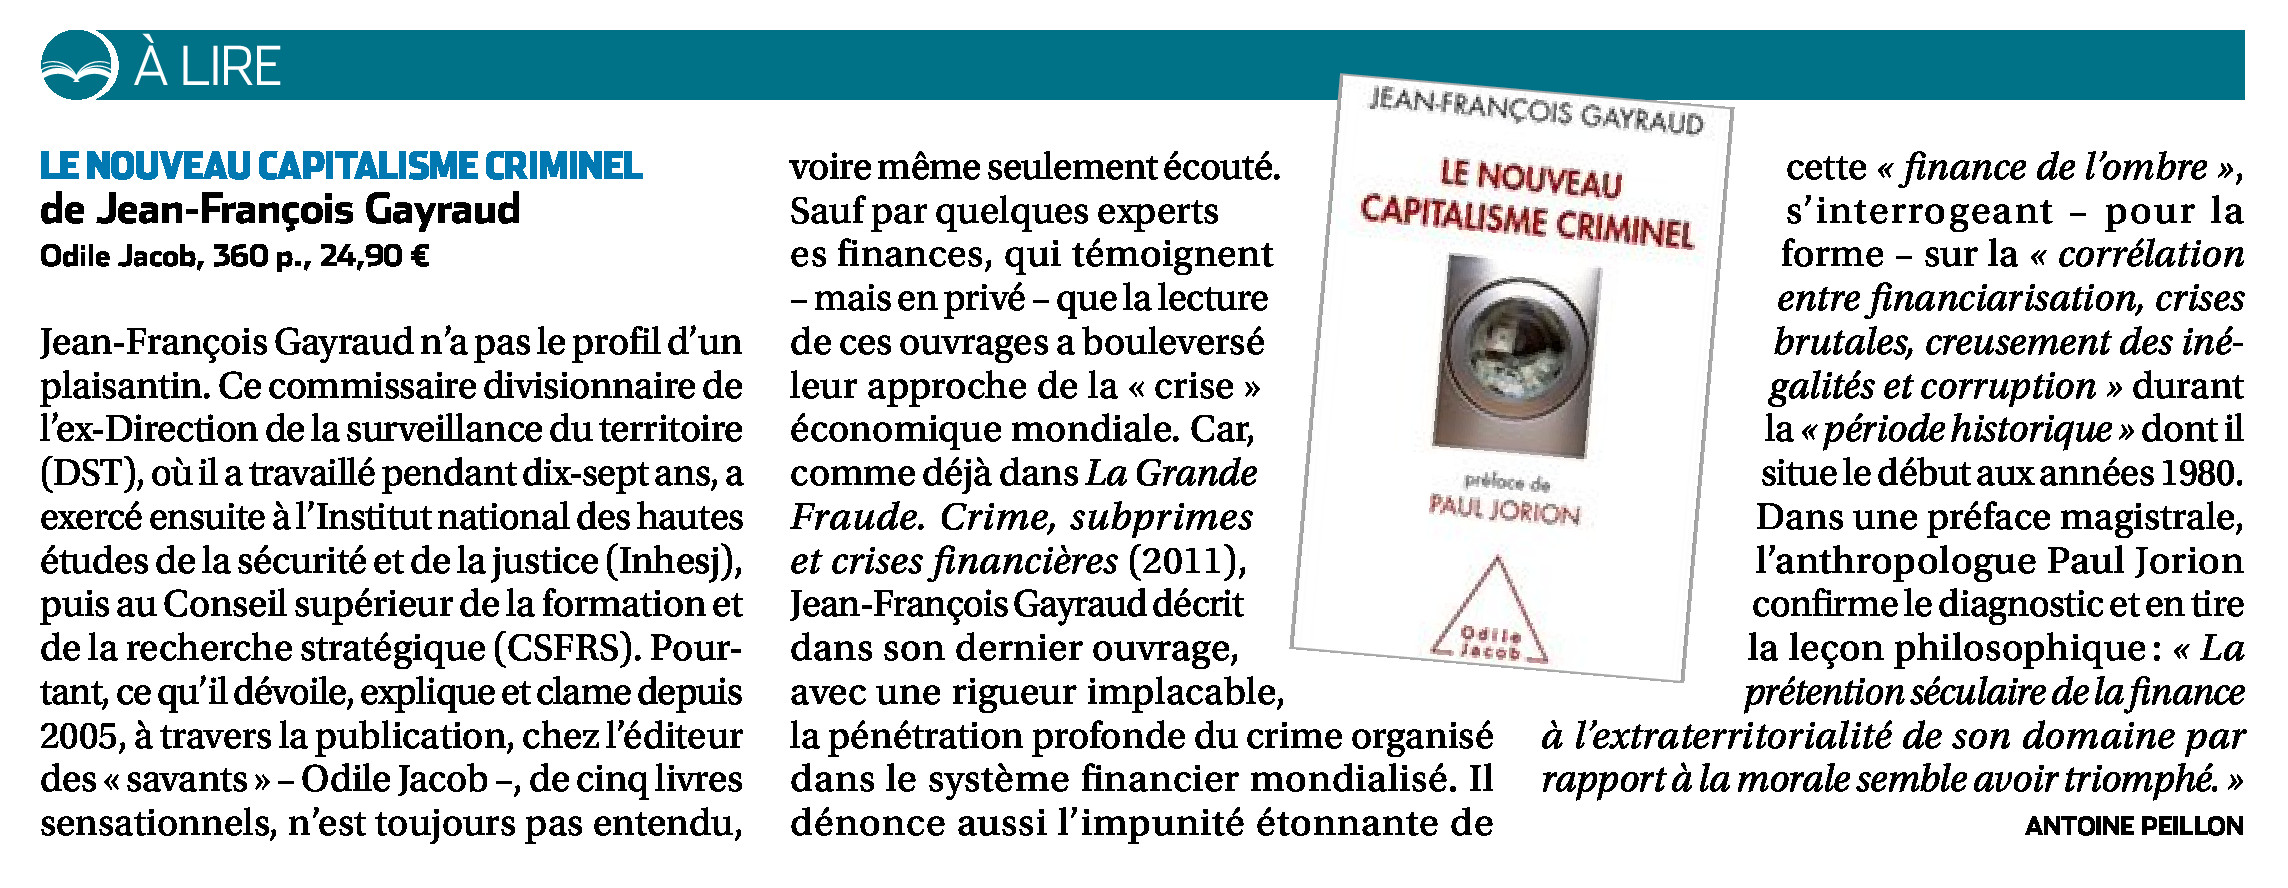 Gayraud-article-2014-06-10-004